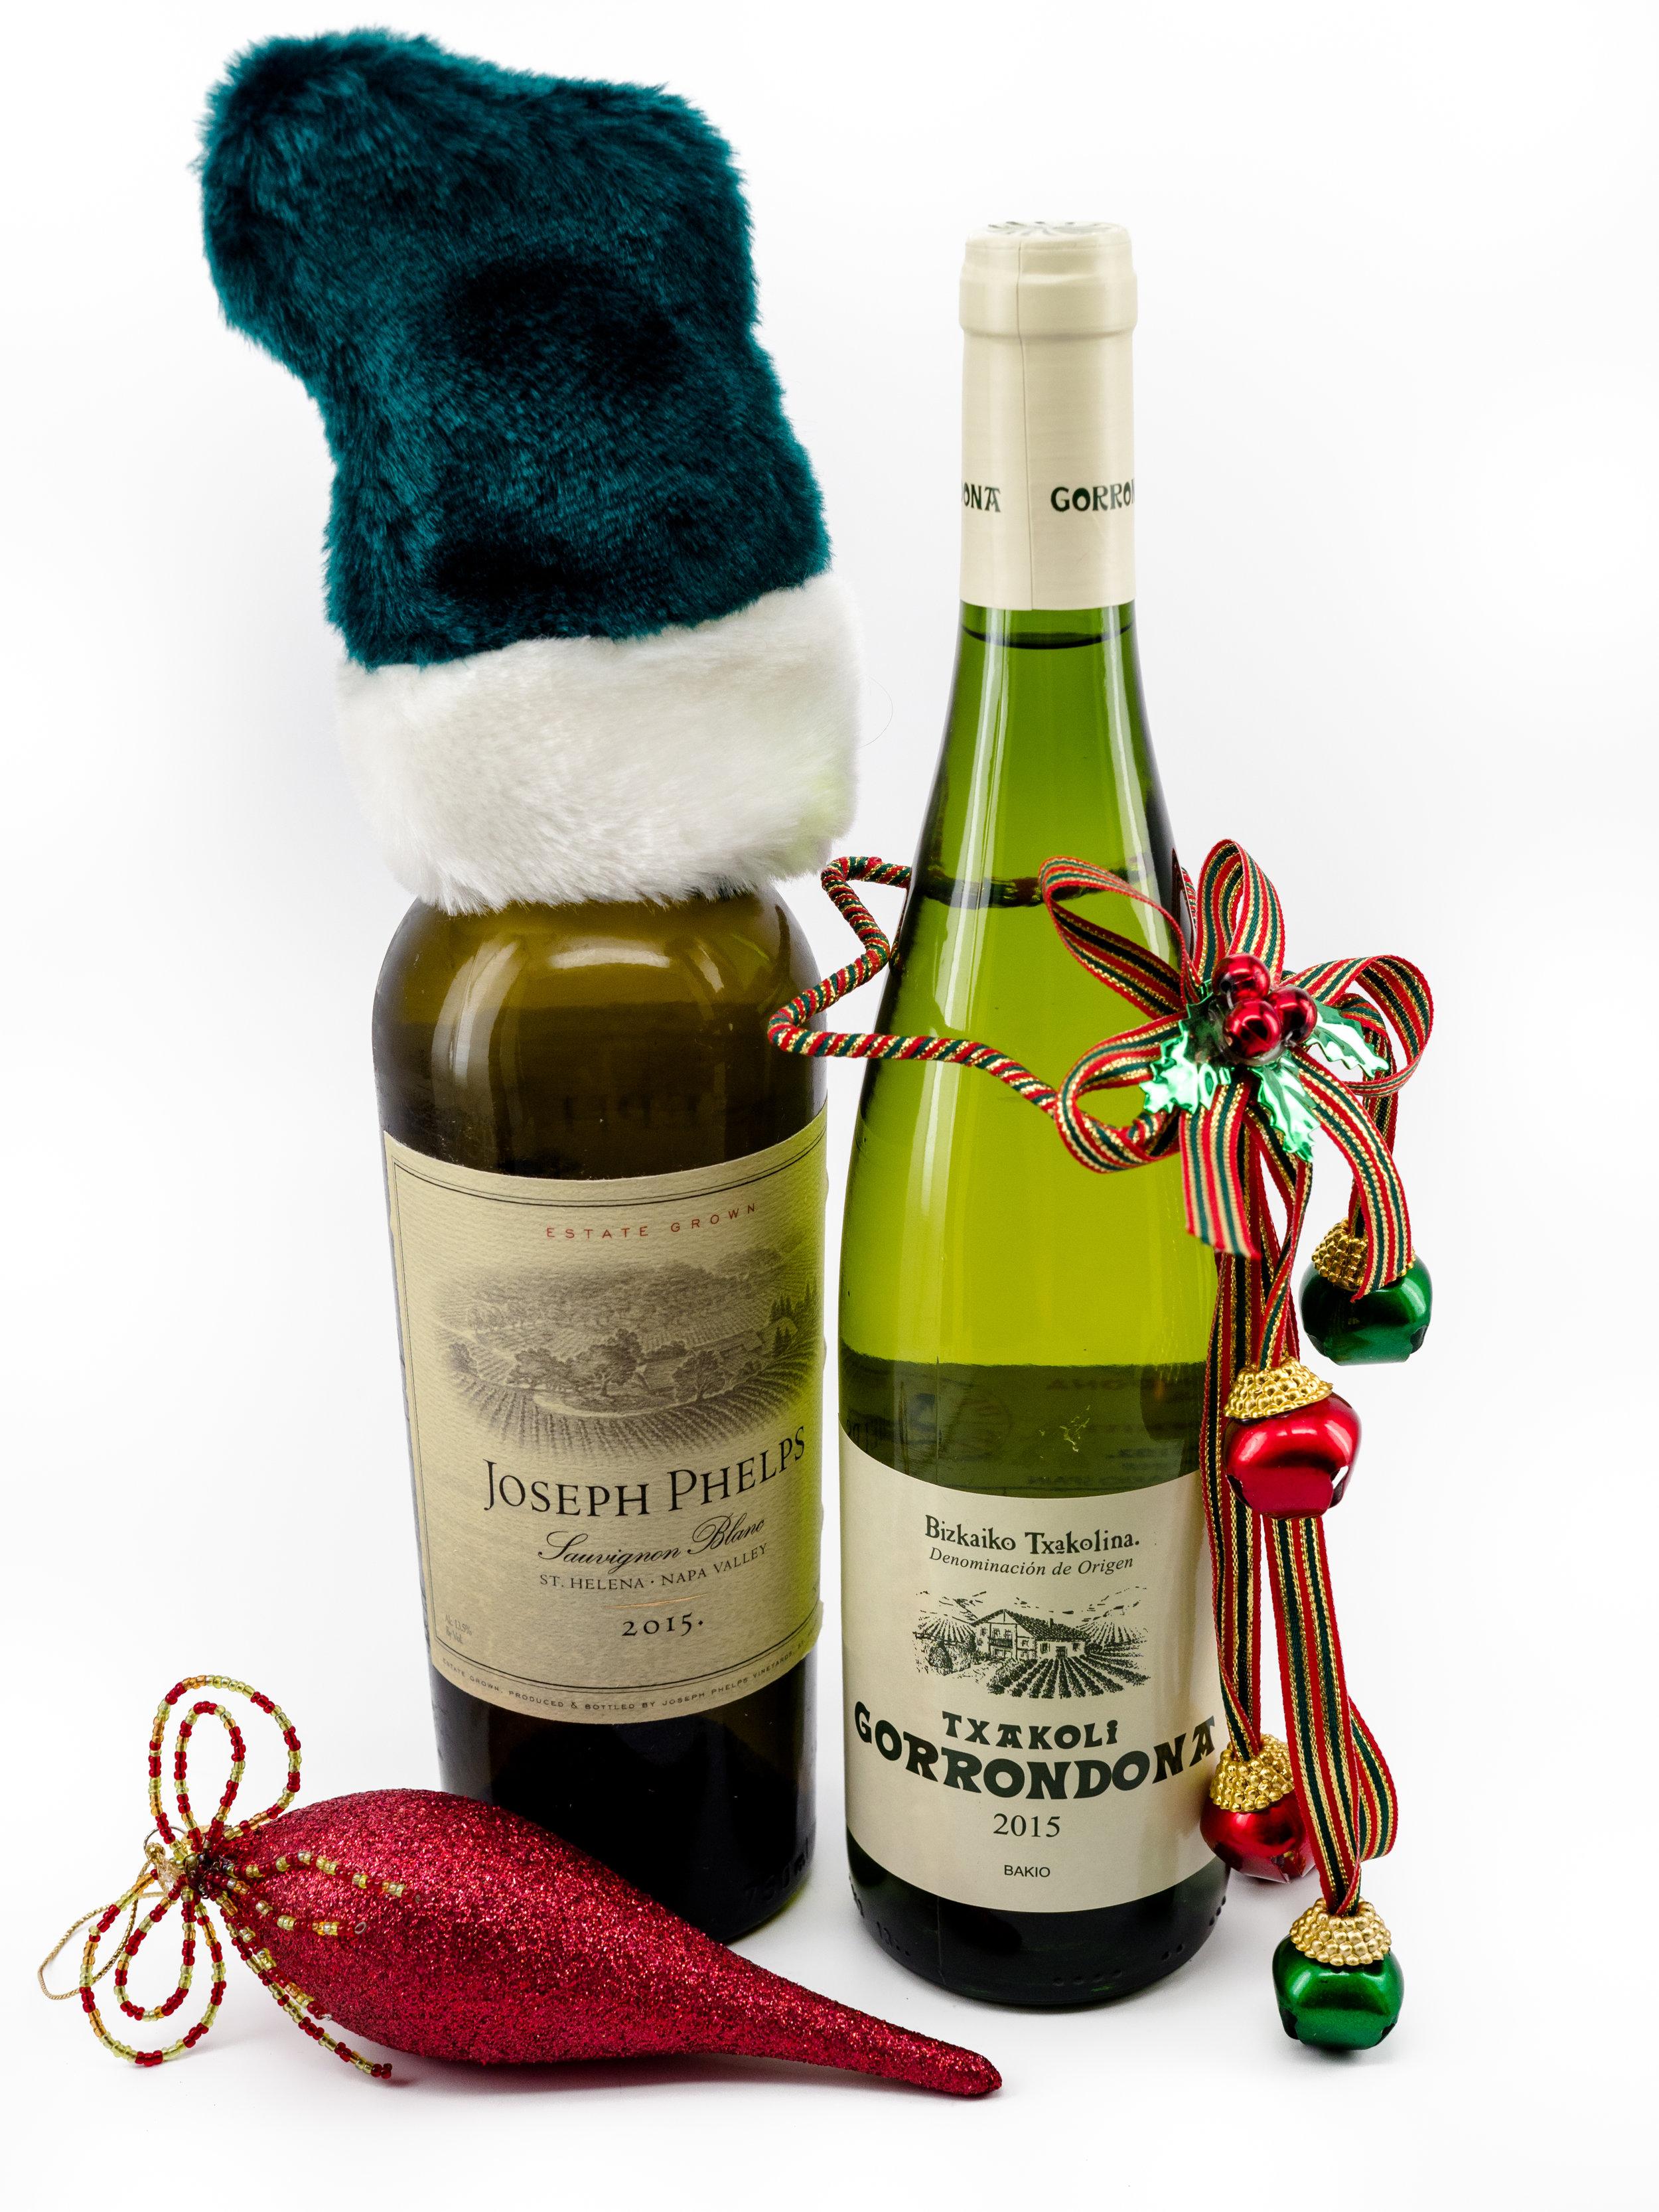 Musings by the Glass - Mele Kalikimaka - Hawaiian Christmas Music and Wine Pairings - Wine and Christmas!